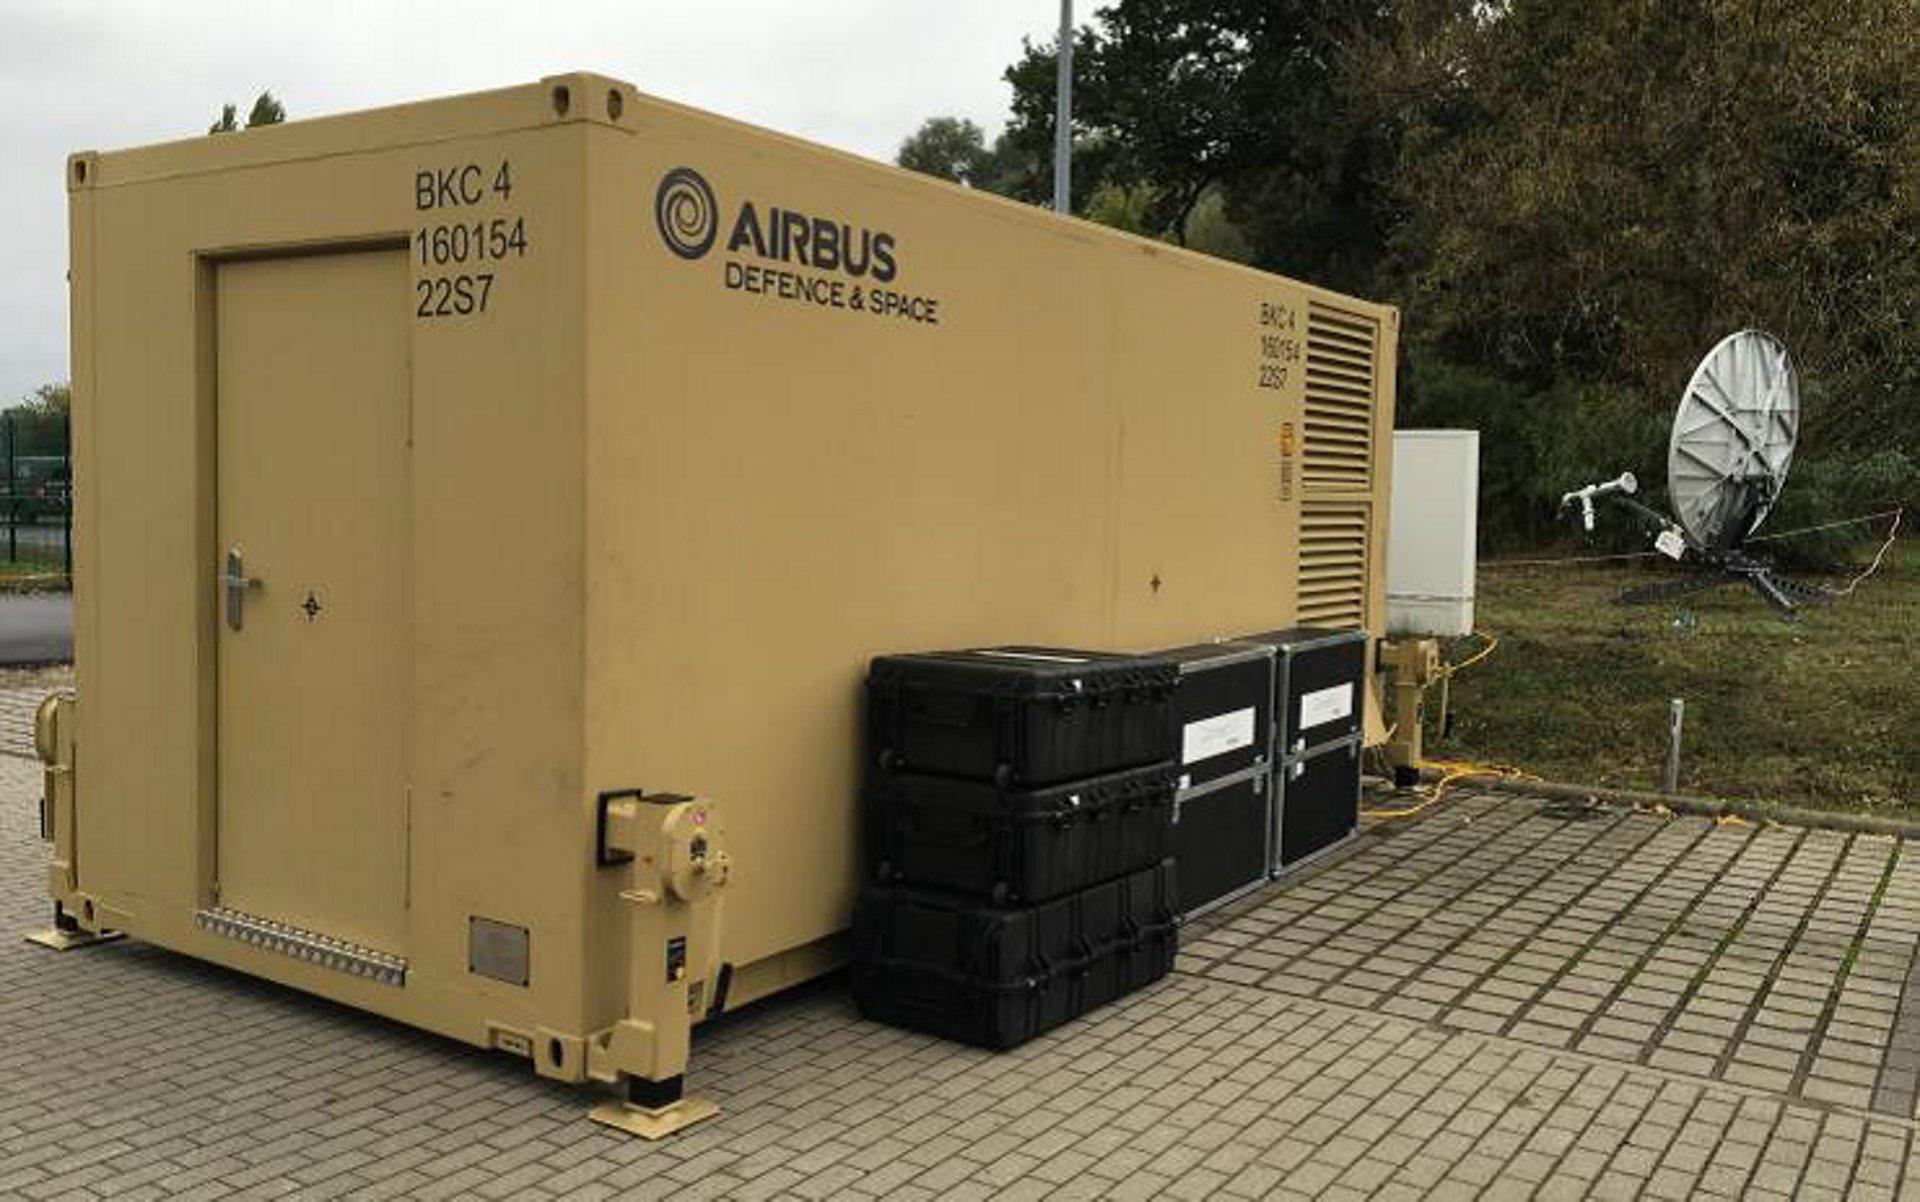 German Troops Support Communications Worldwide